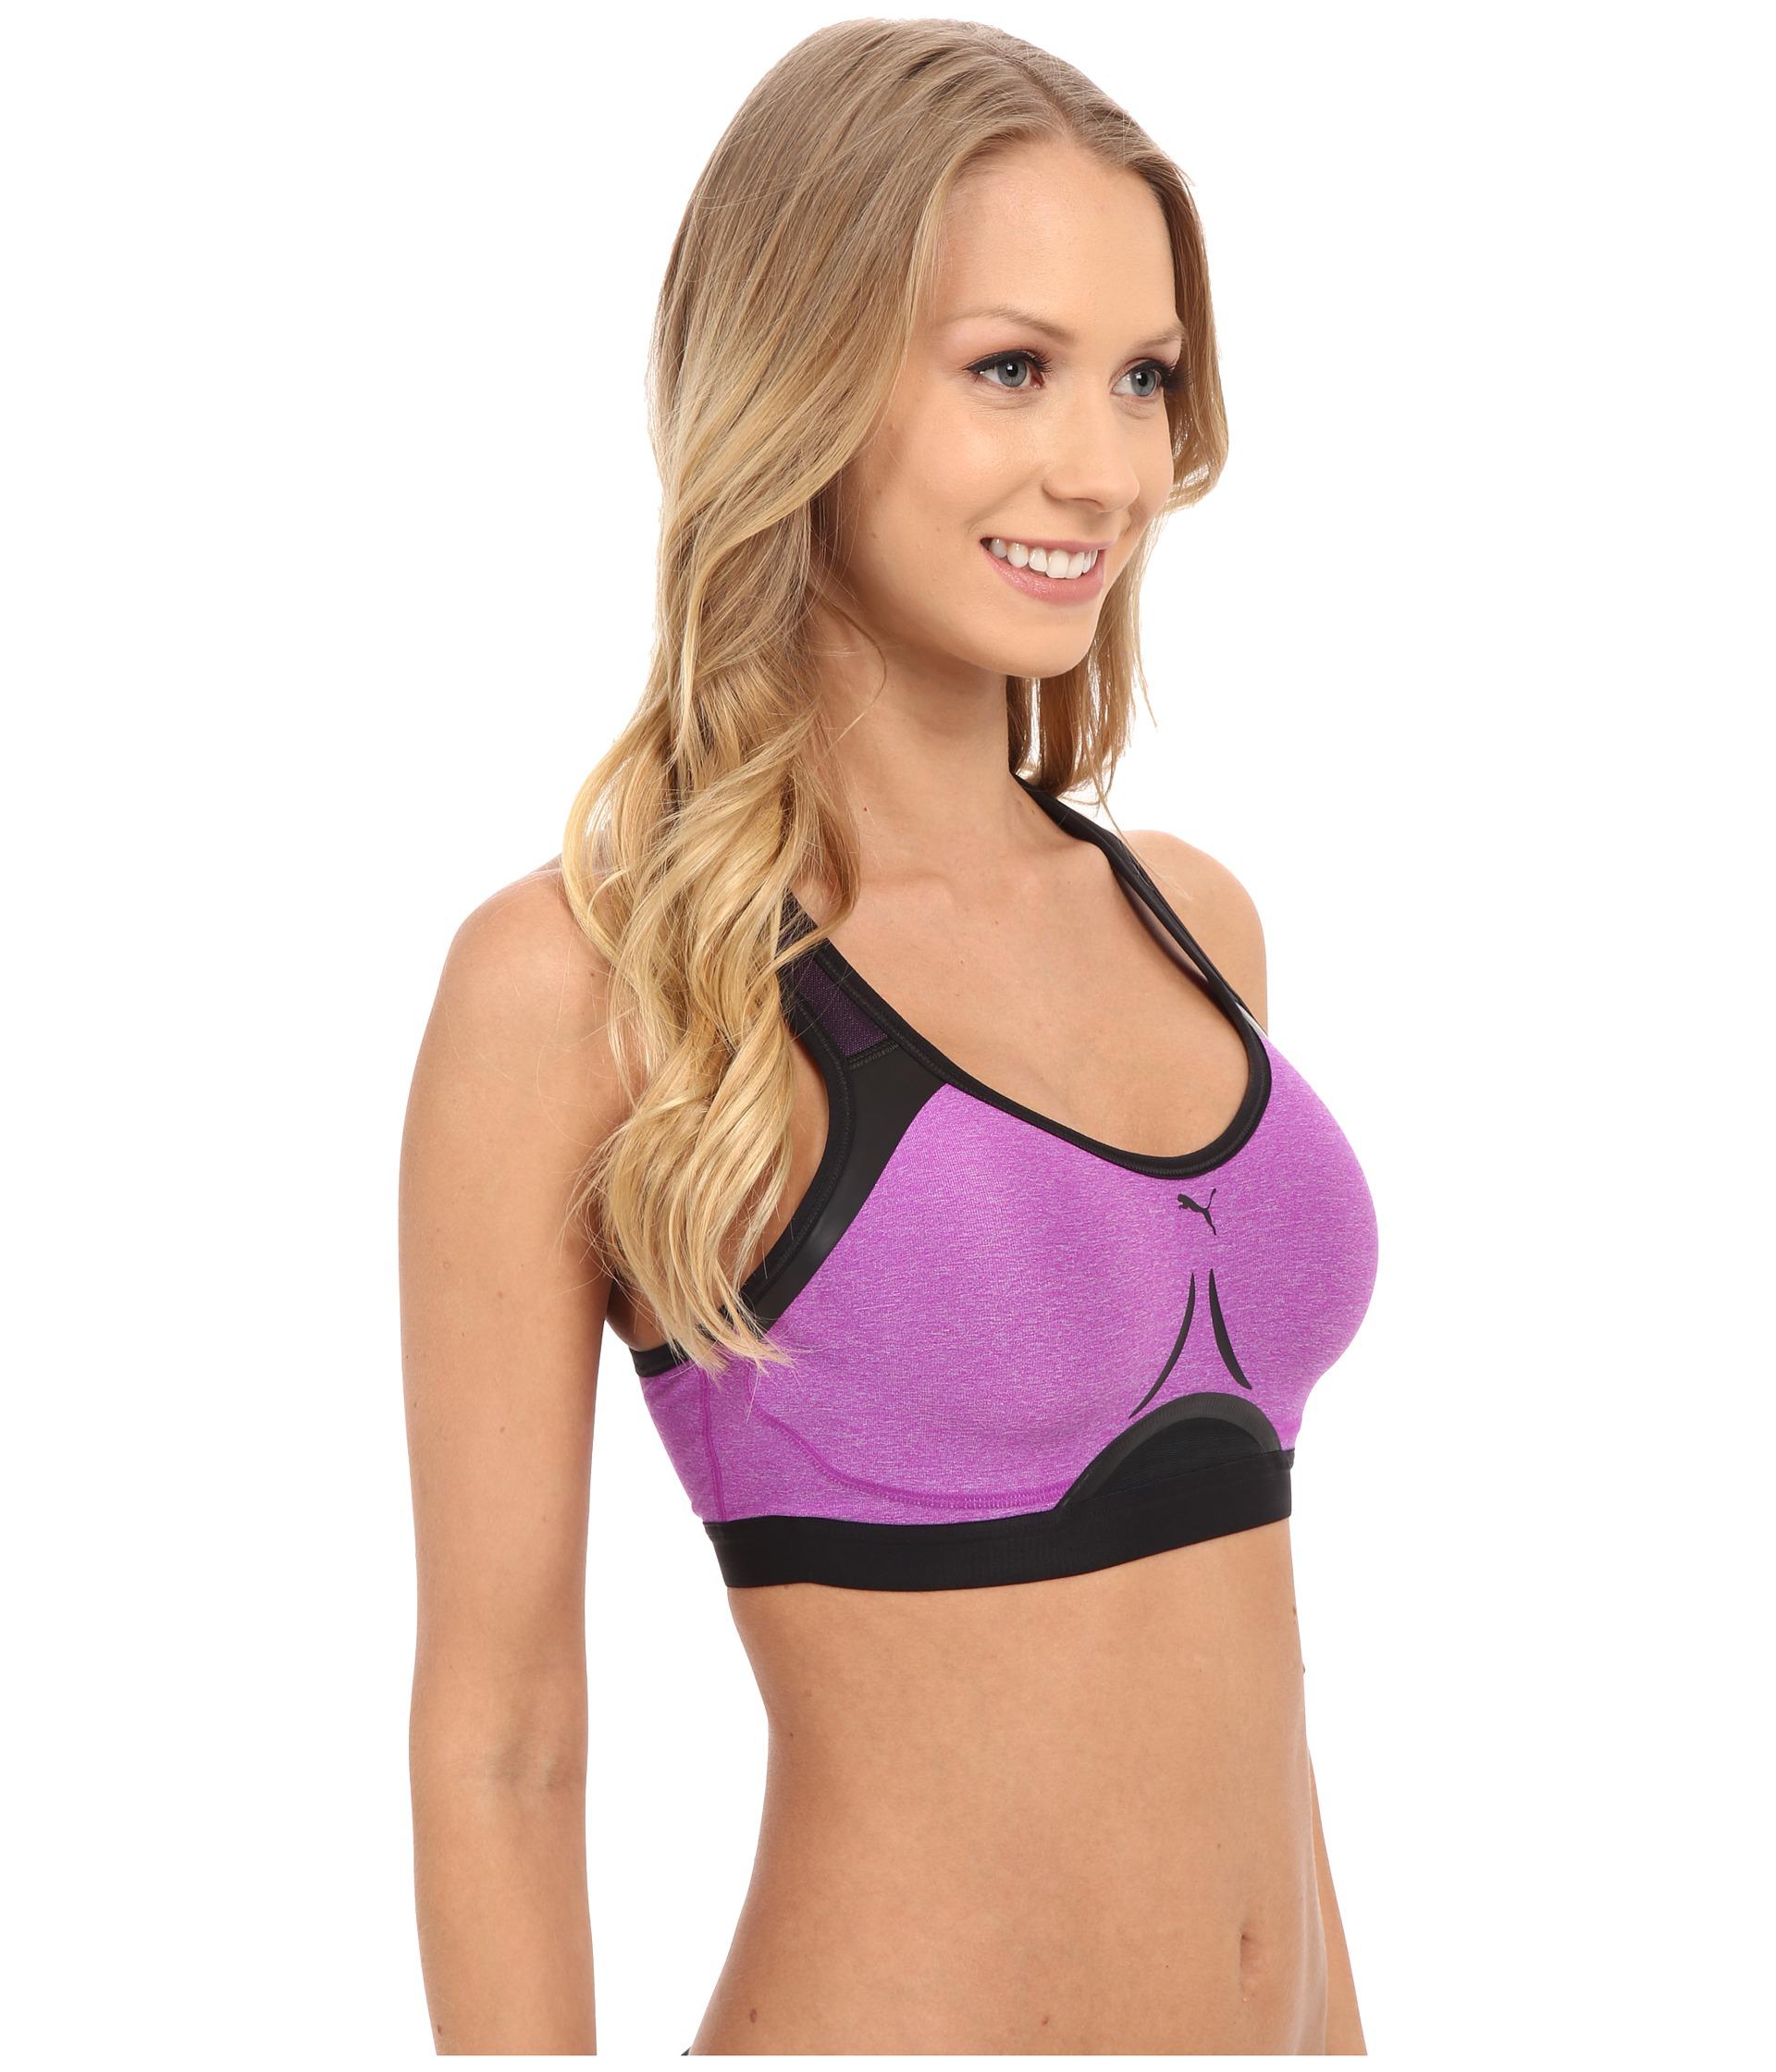 1c2980fca4d84 Lyst - PUMA Wt Powershape Bra in Purple